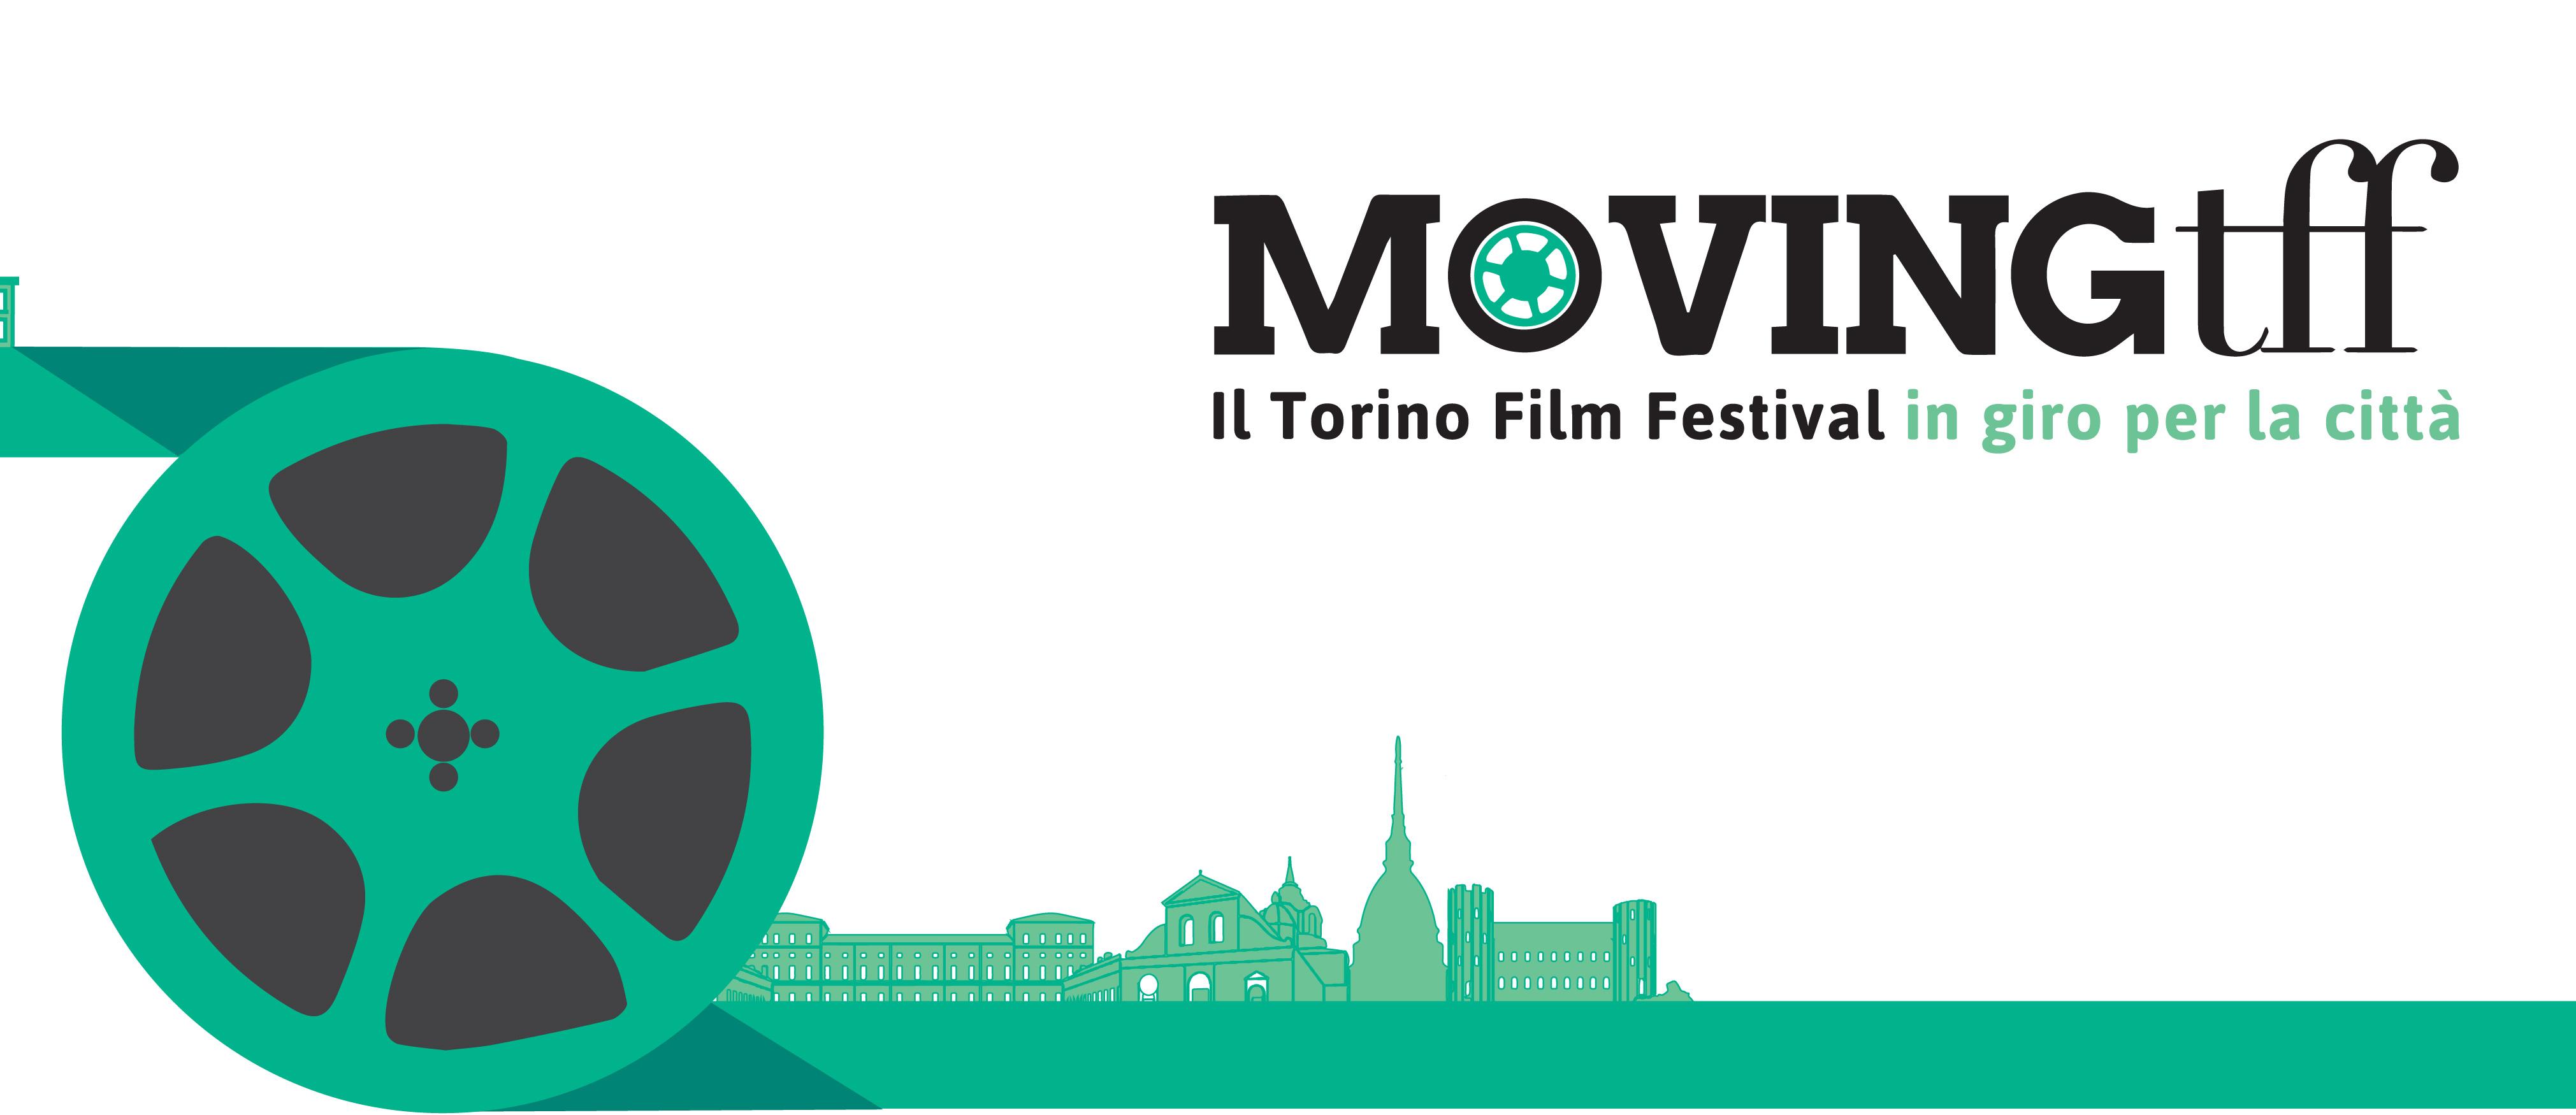 Moving TFF 2017